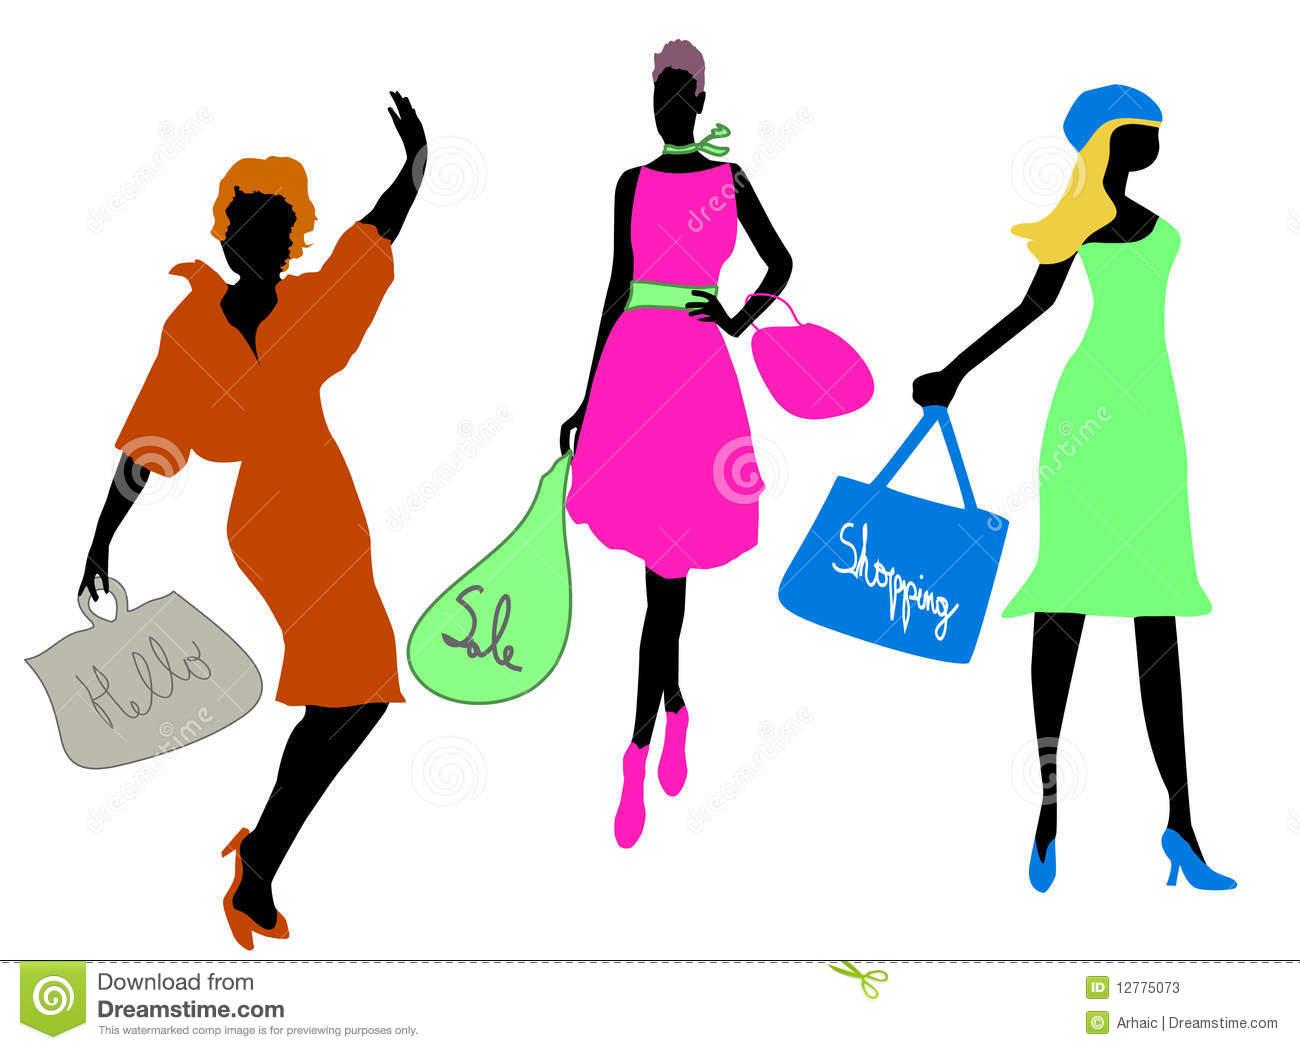 Indian clipart fashion show Clipart Savoronmorehead Clipart Fashion Fashion